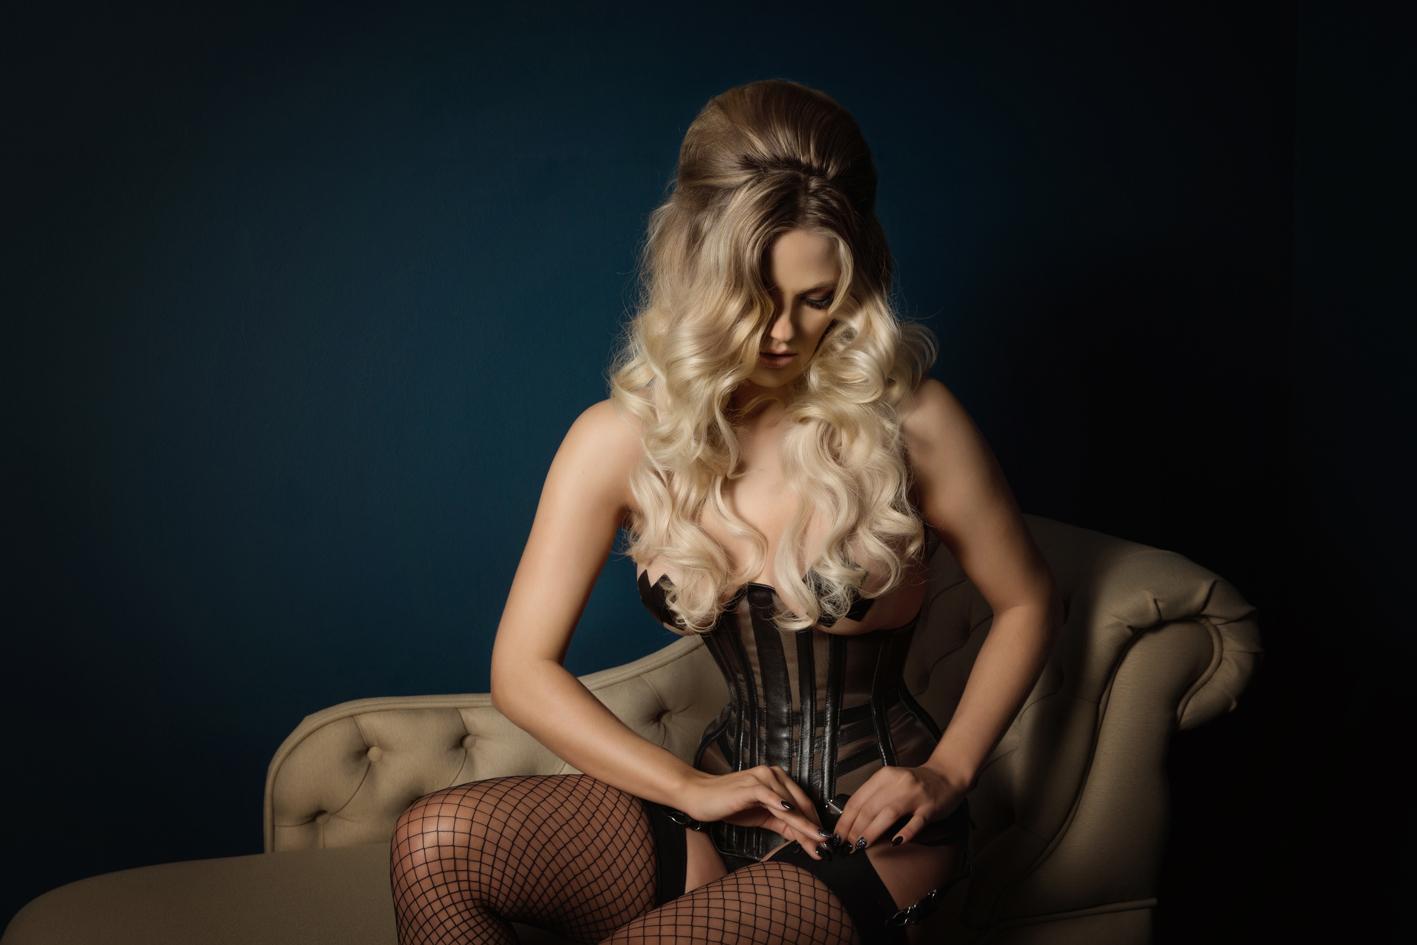 mina corset looking down.jpg